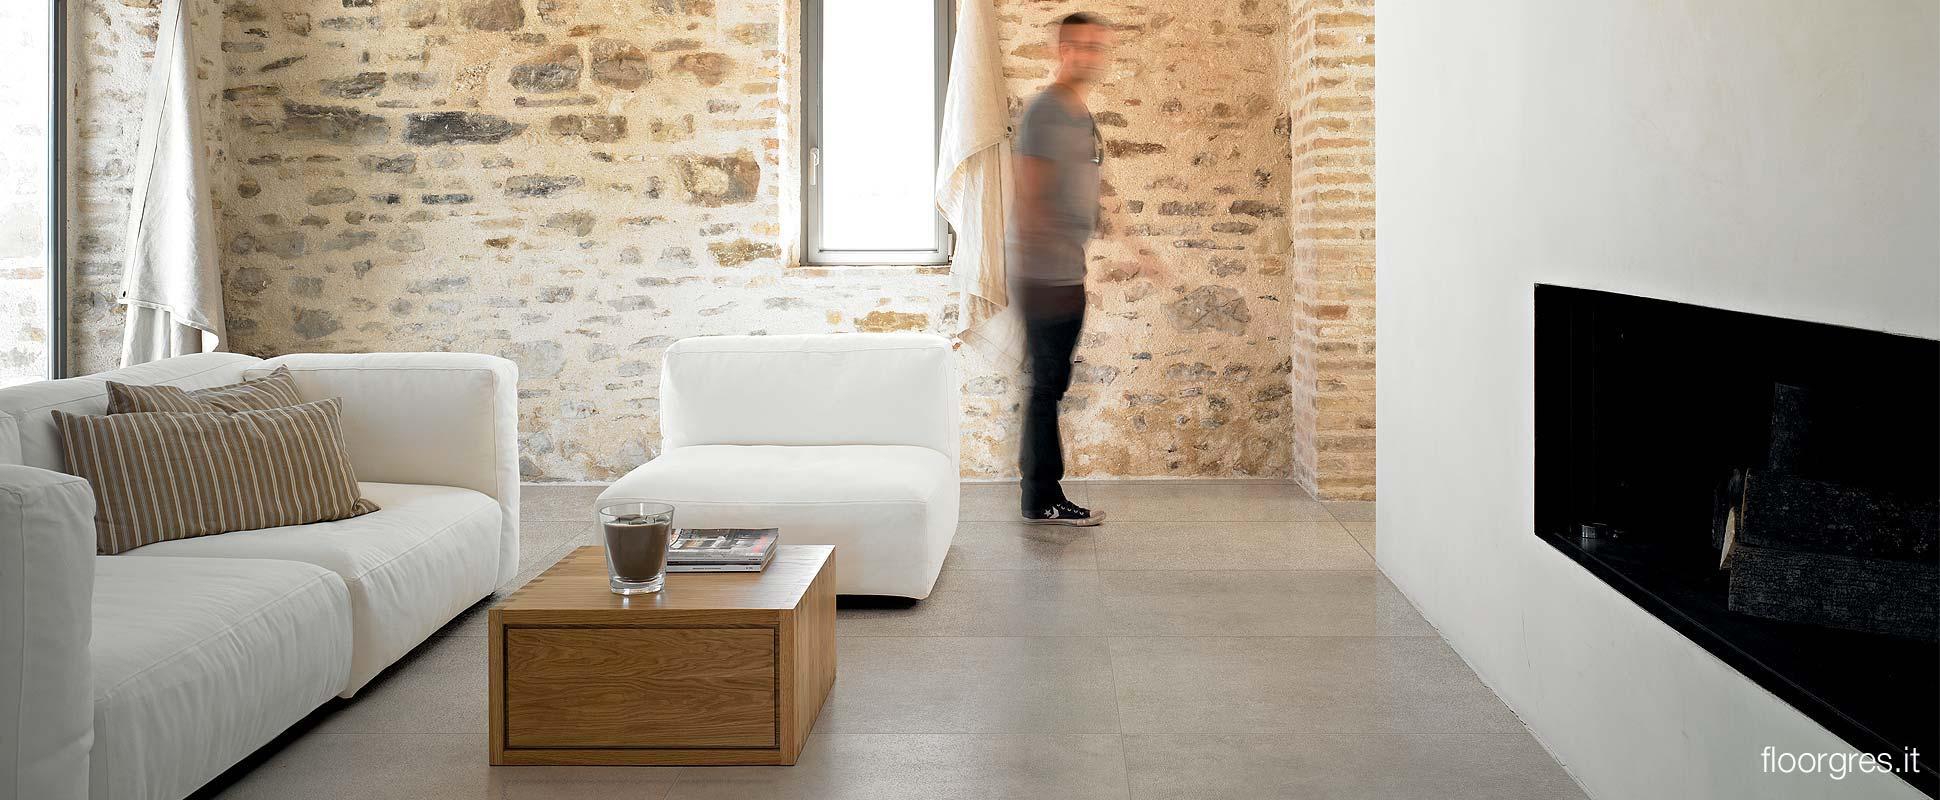 Tono Bagno - Floorgress Industrial baño